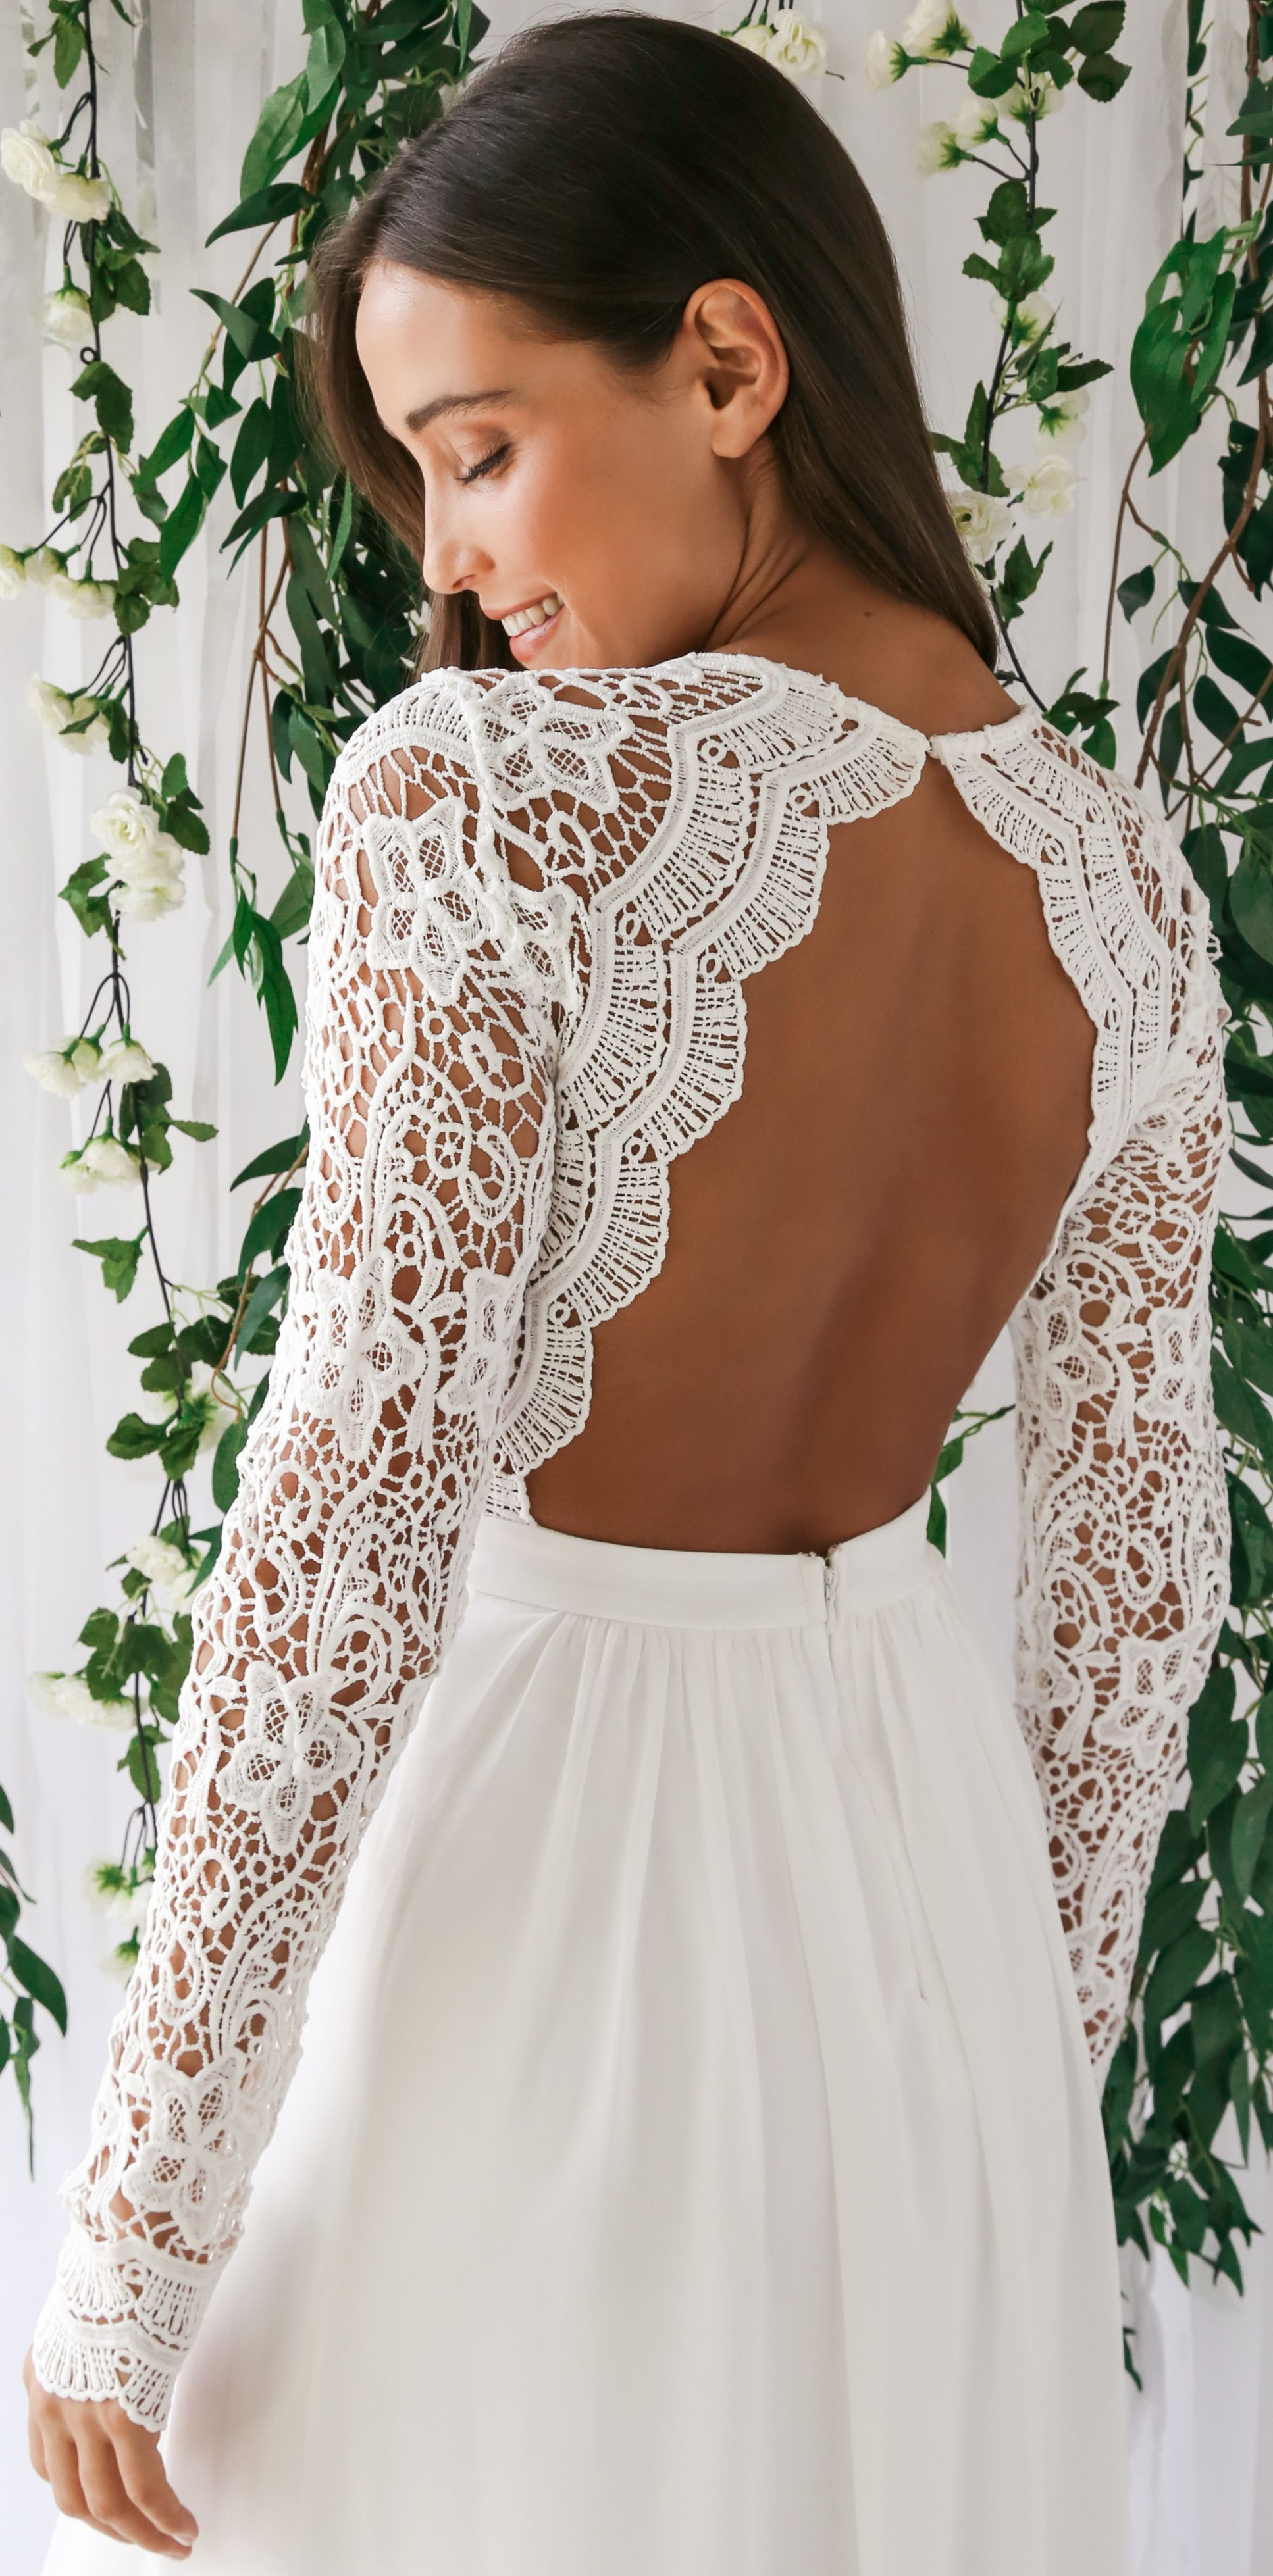 Awaken My Love White Long Sleeve Lace Maxi Dress Long Sleeve Lace Maxi Dress Wedding Dress Outfit Lace Maxi Dress [ 3915 x 1934 Pixel ]